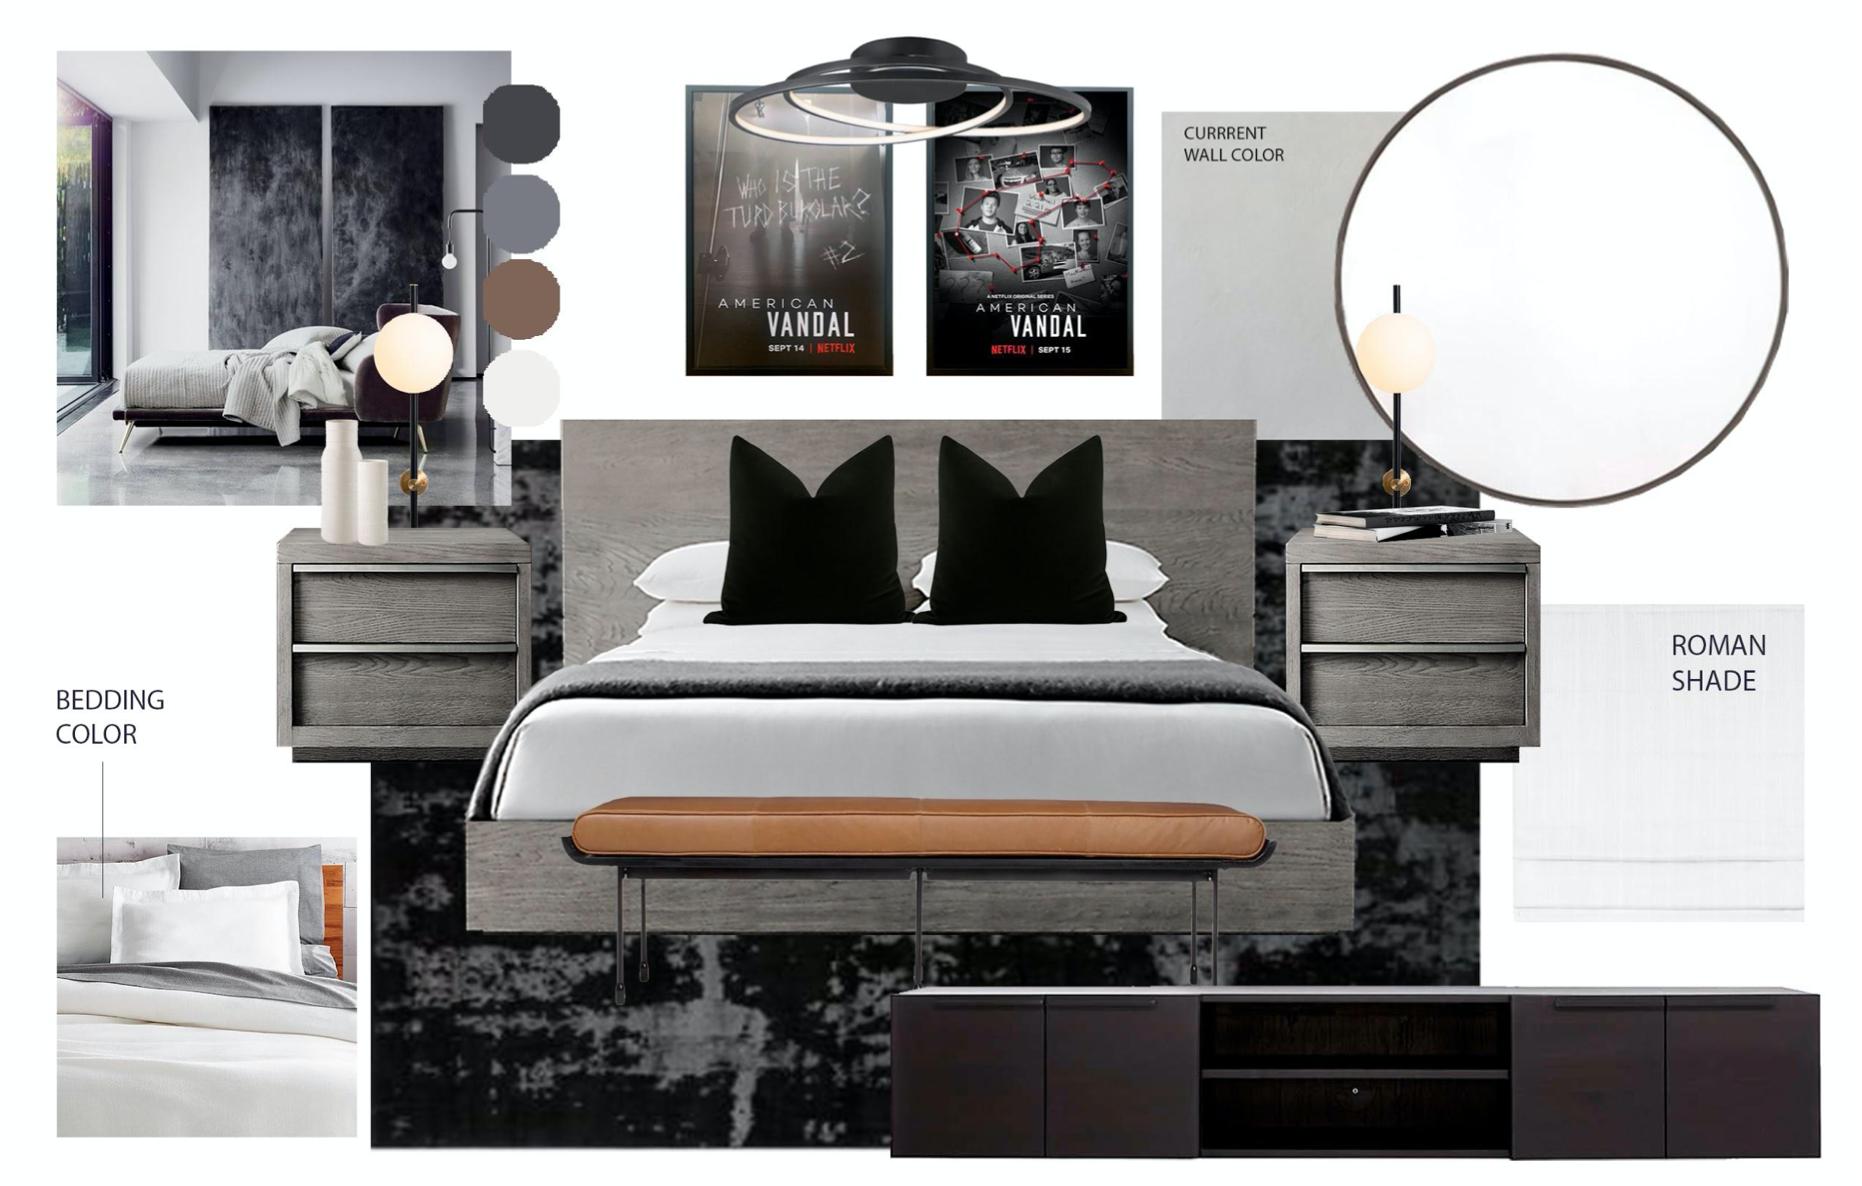 rterior-studio-westside-la-bachelor-pad-bedroom-design-inspriation-with-leather-moody-feel